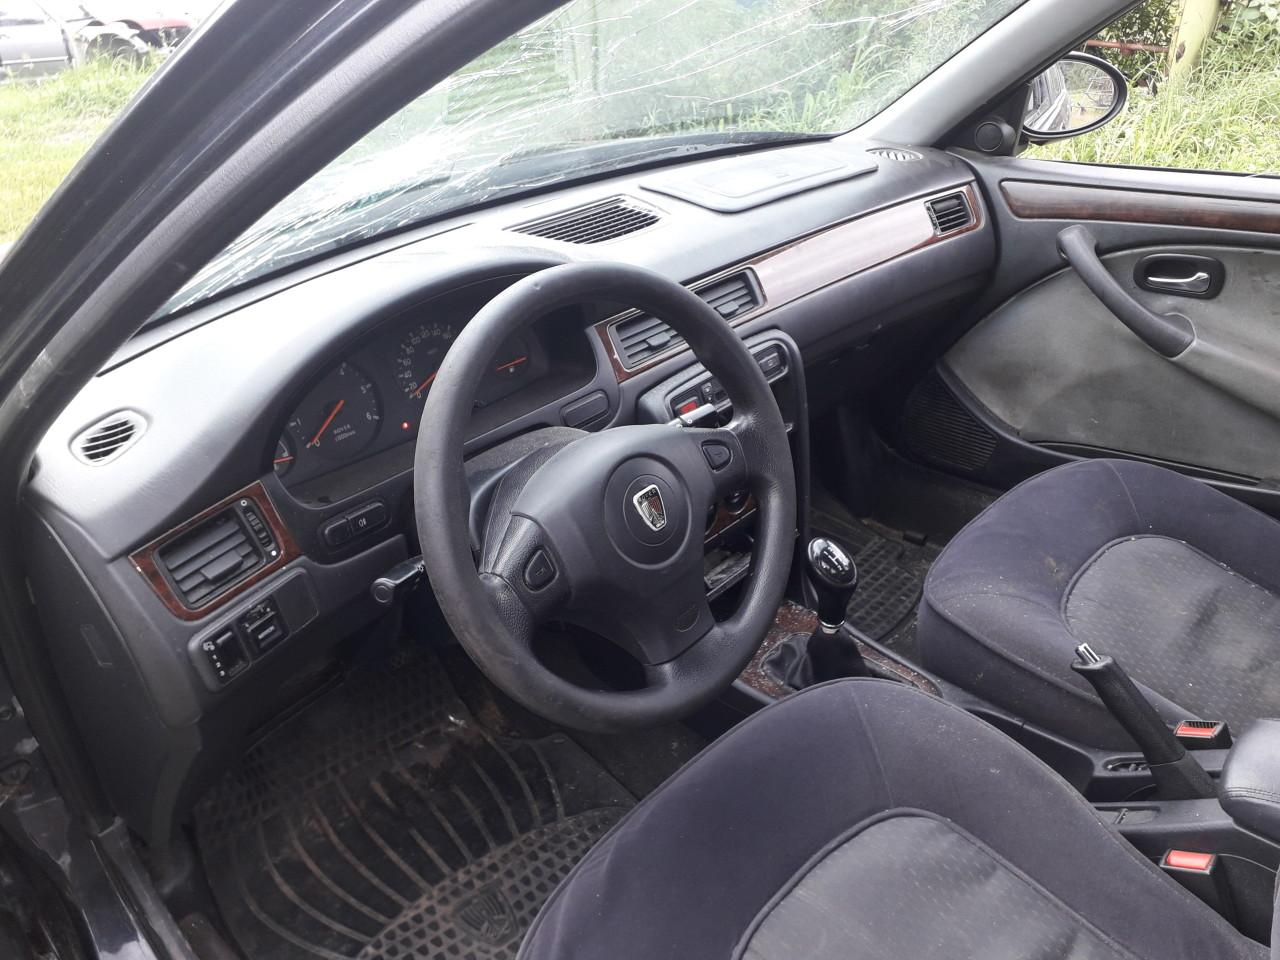 Dezmembrez/piese Rover 45 2.0d 101cp model 1999-2005